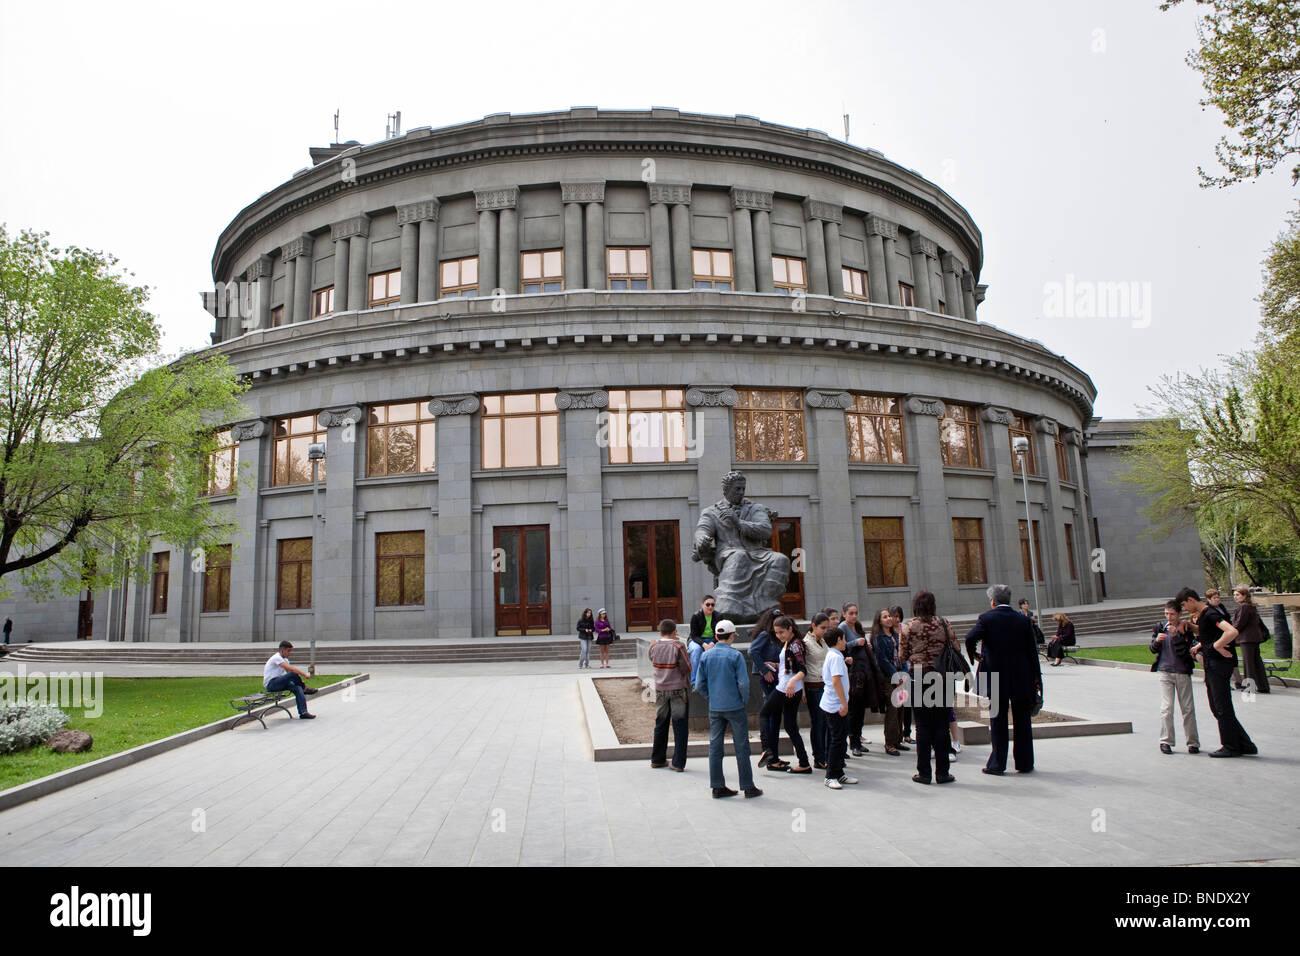 Opera House, concert hall, Yerevan, Armenia - Stock Image